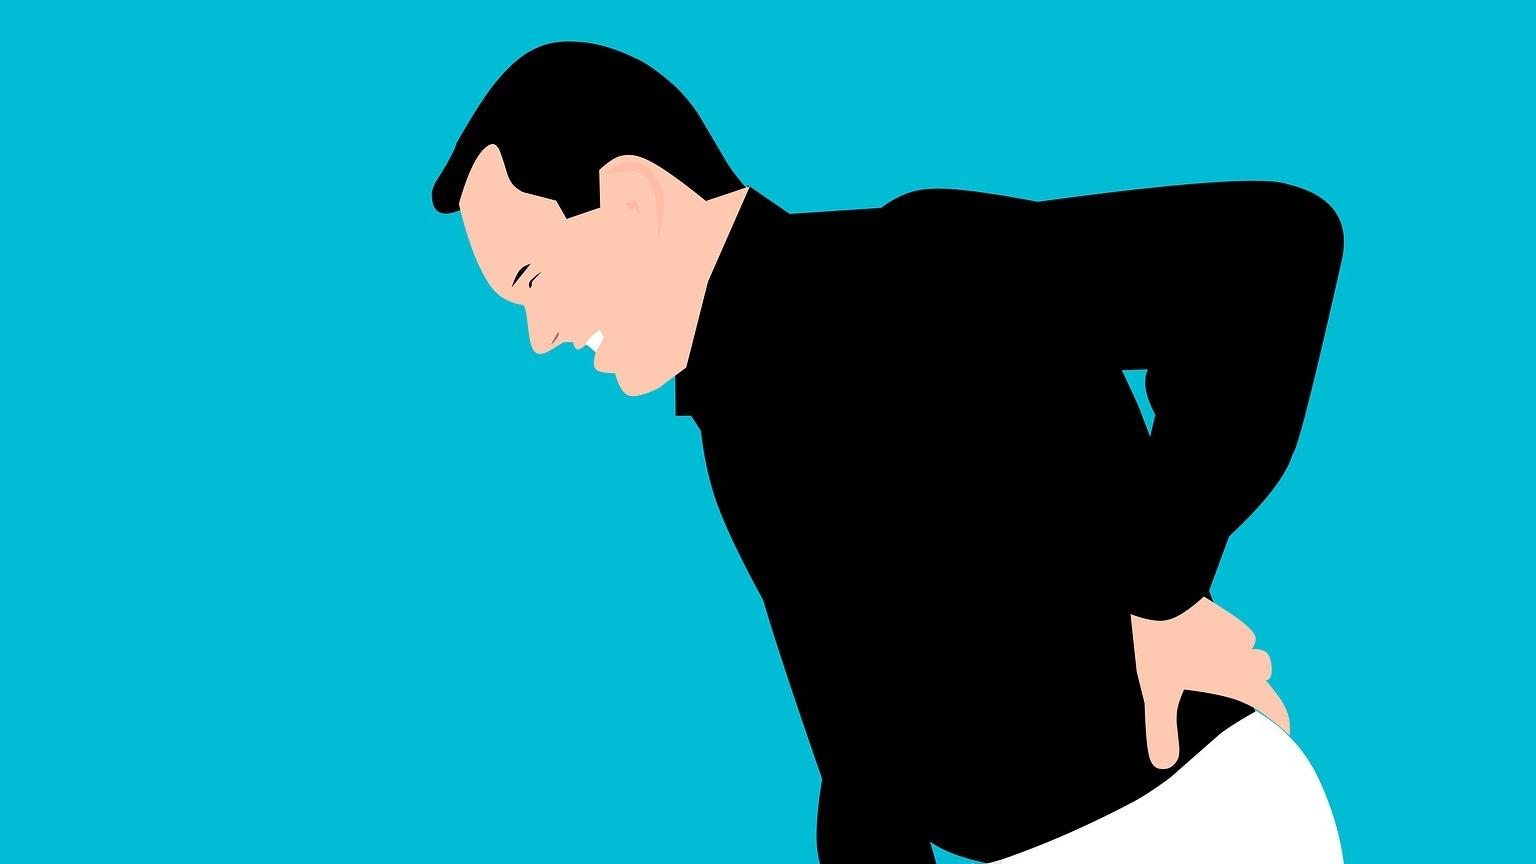 ISG-Arthrose macht sich durch Schmerzen im unteren Rücken bemerkbar.